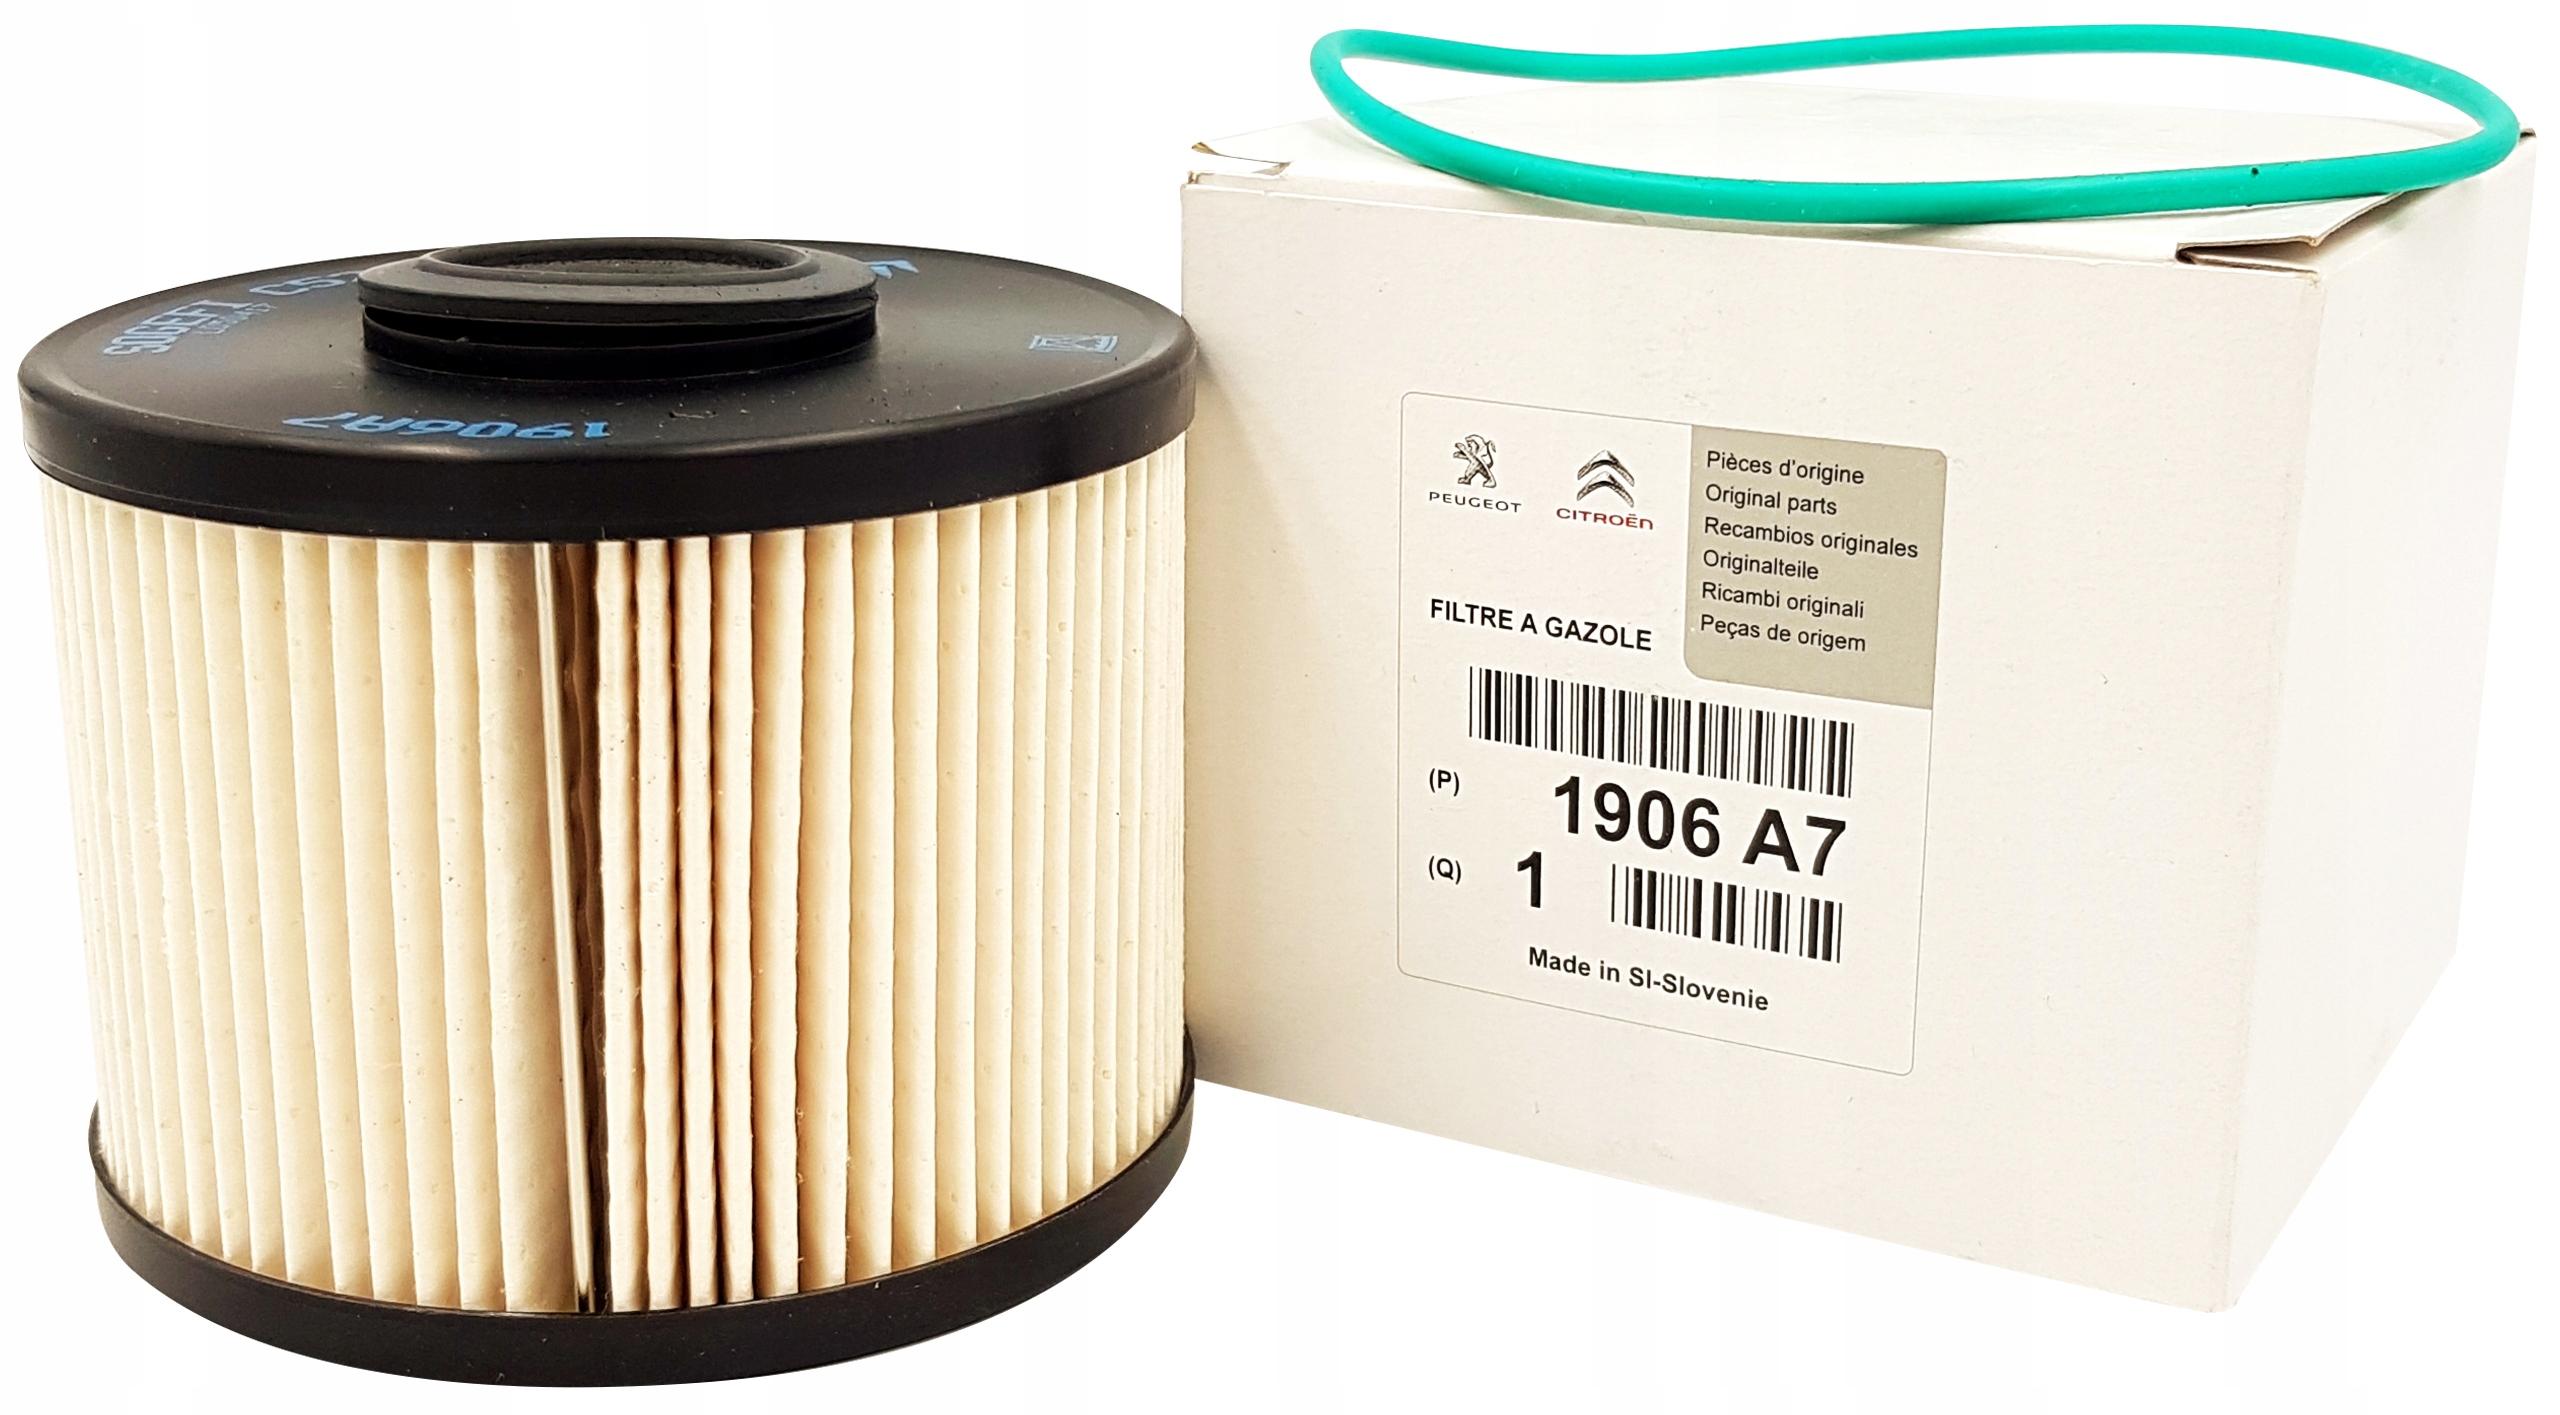 citroen c4 grand пикассо c5 20 hdi фильтр топлива